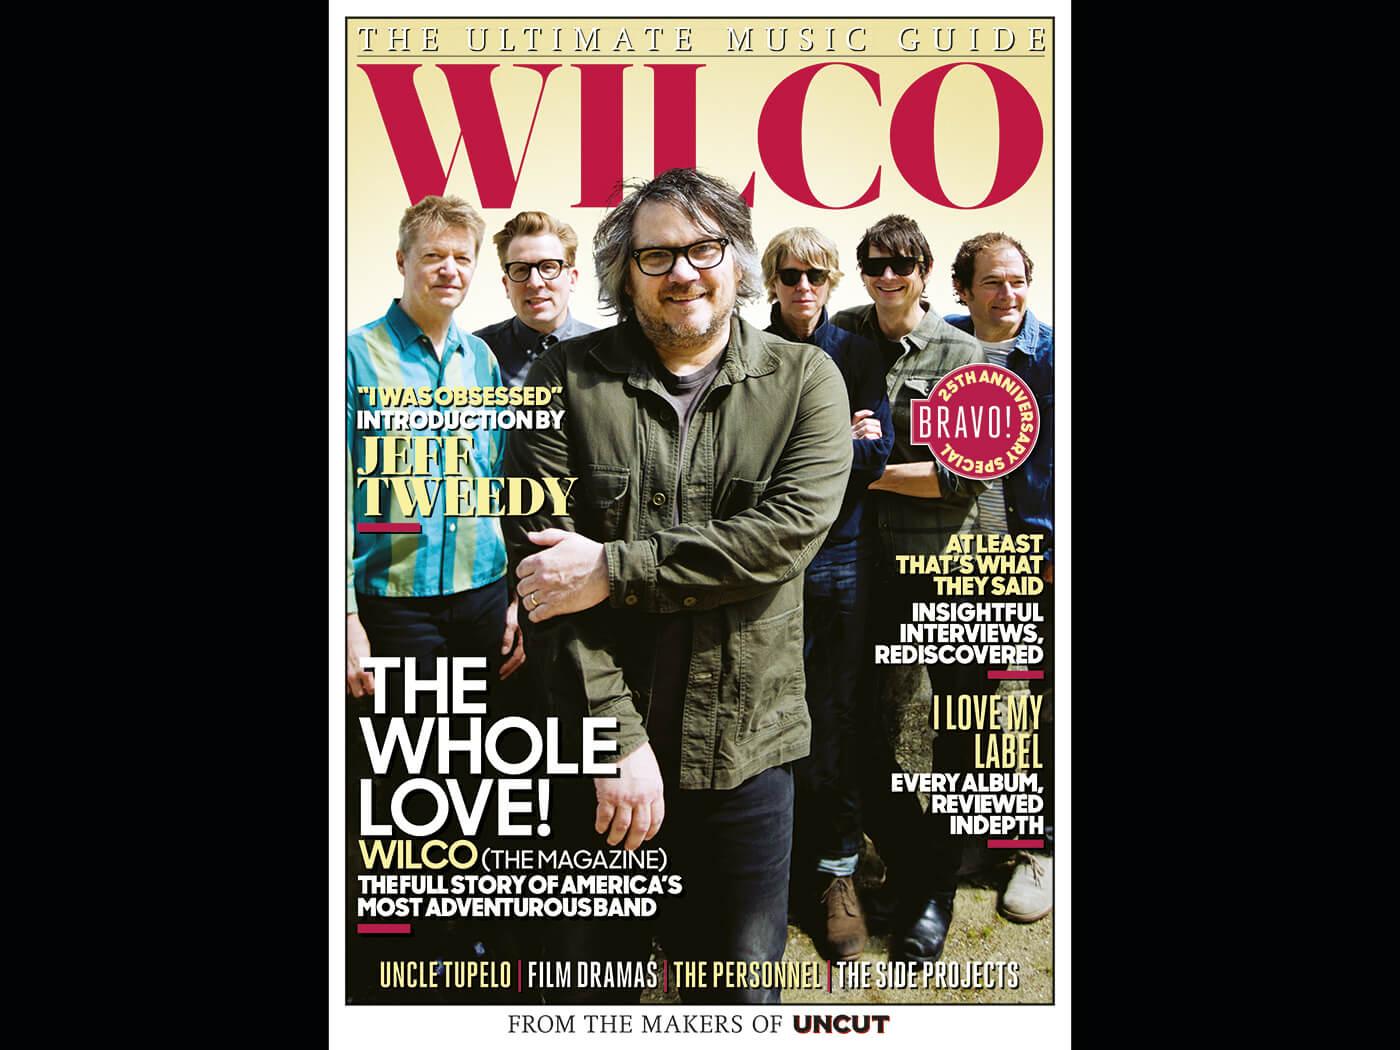 Wilco – The Ultimate Music Guide